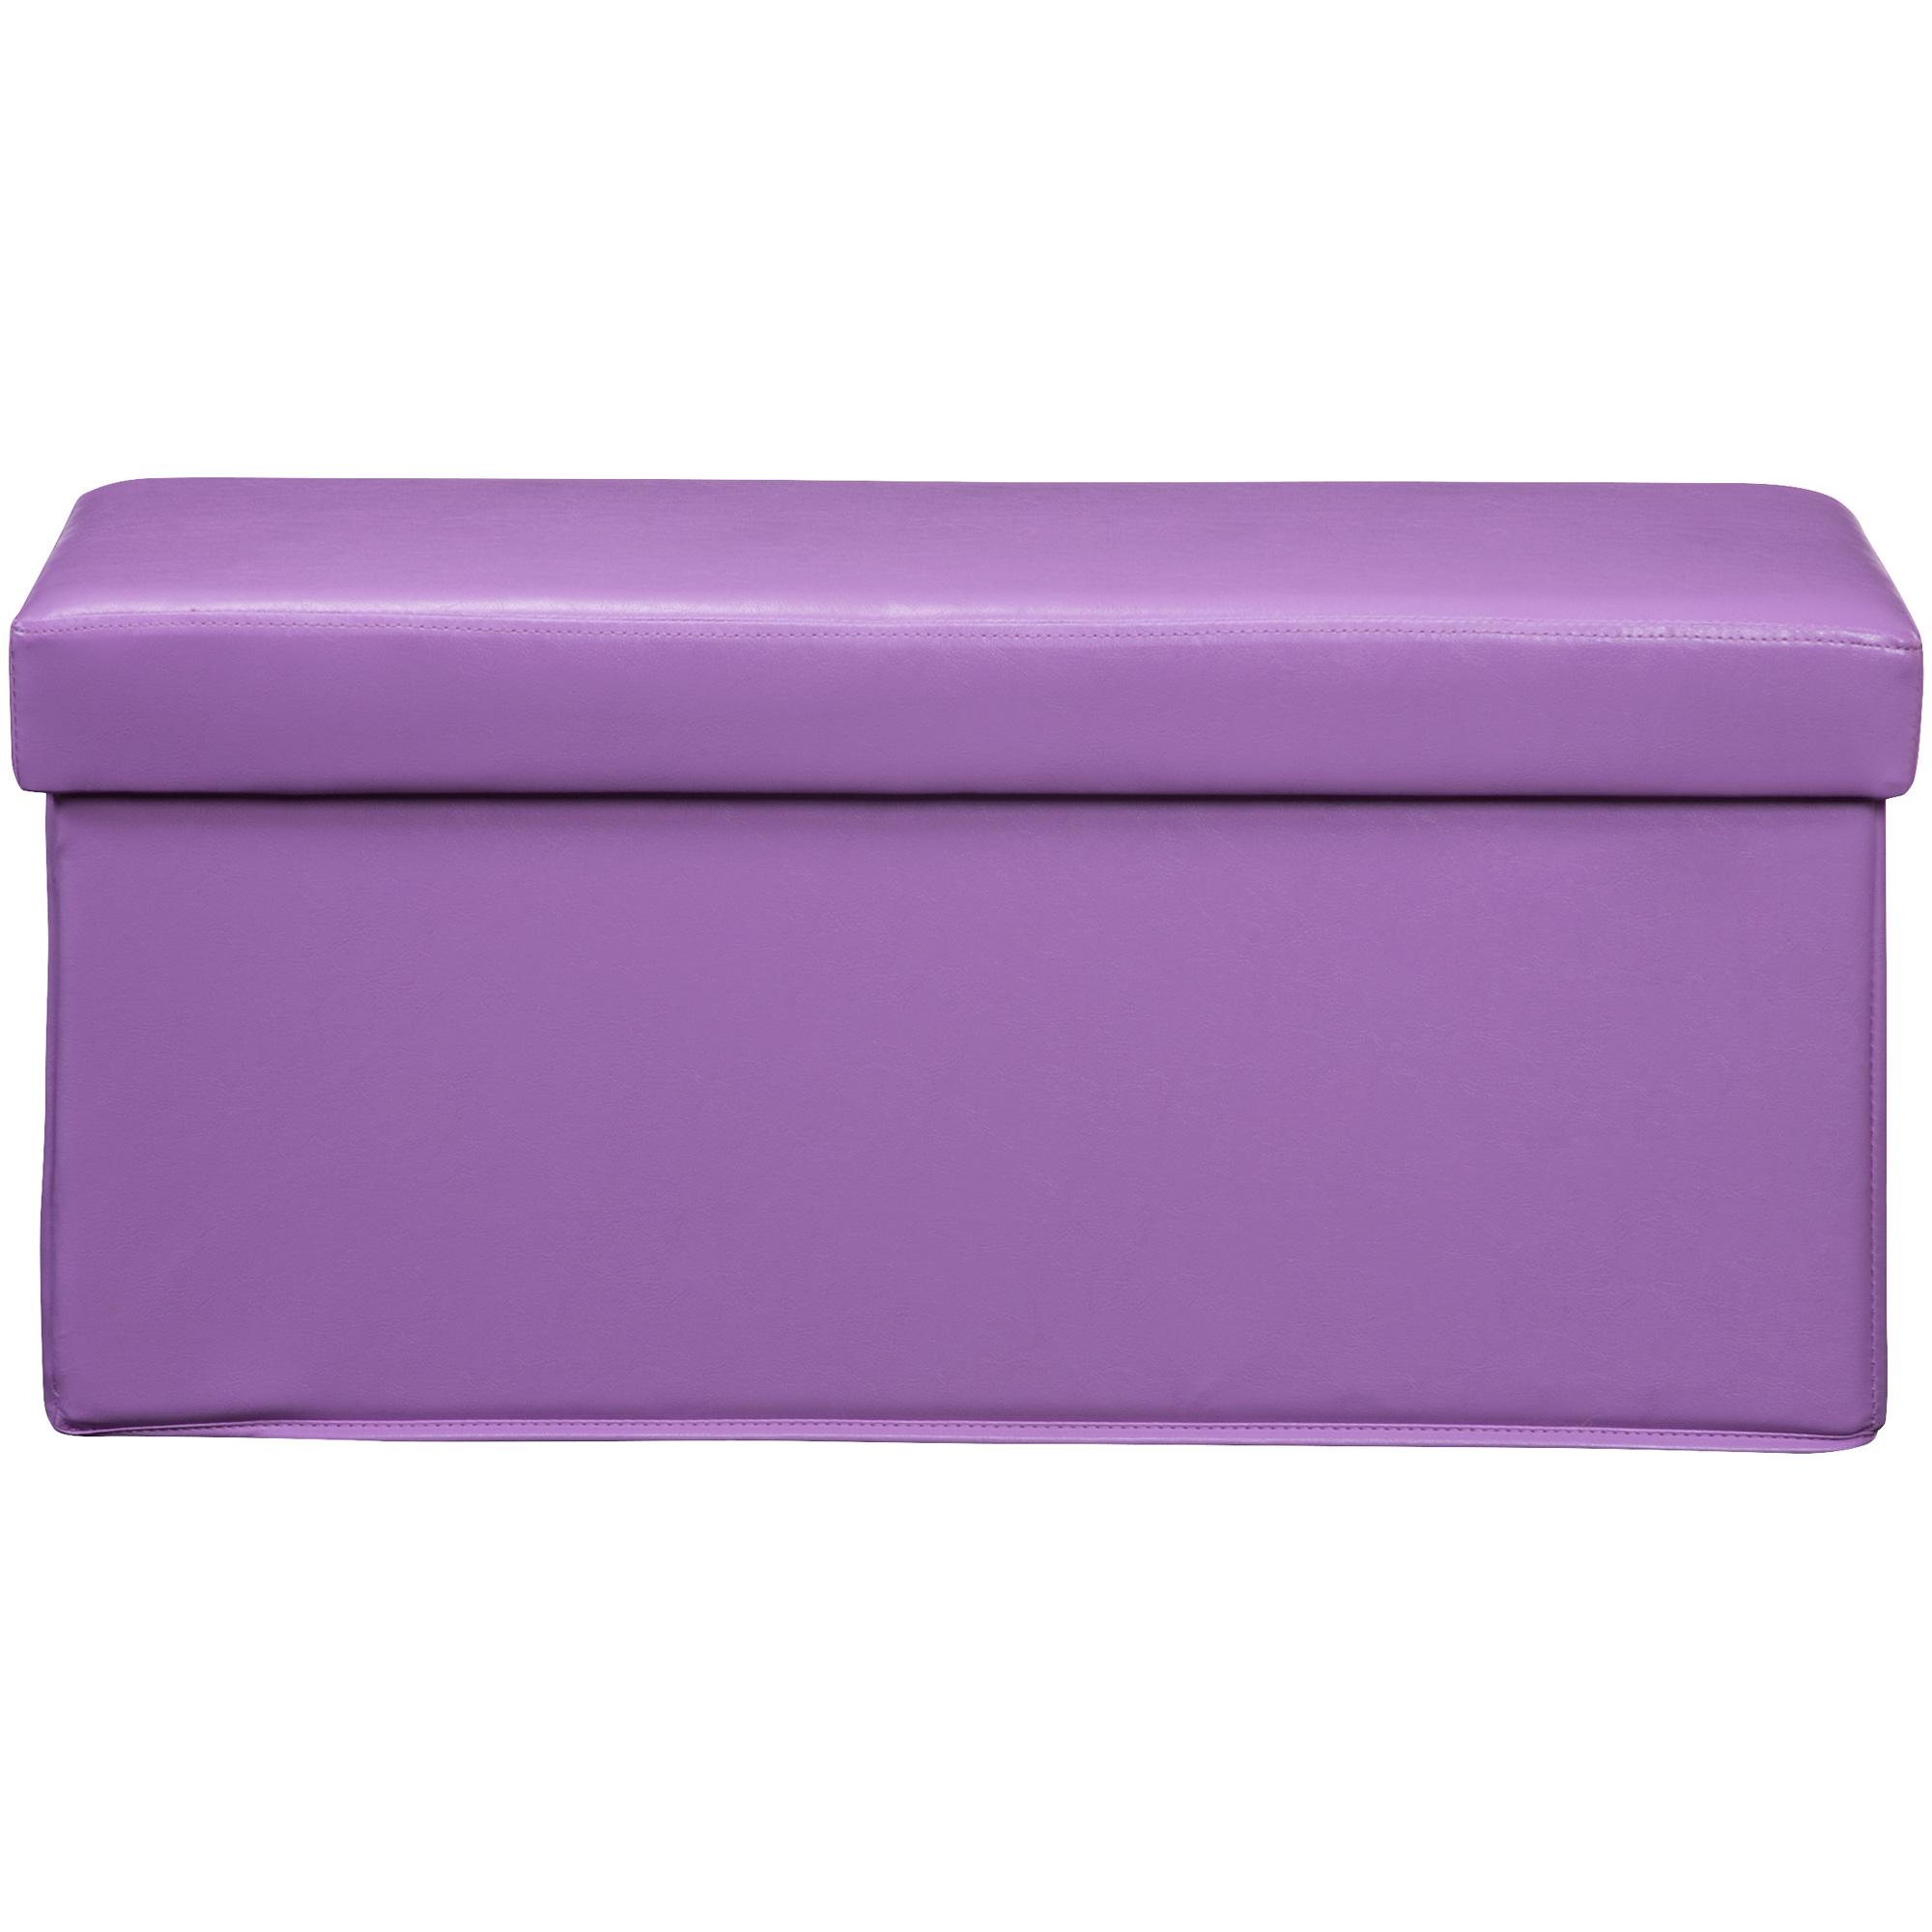 Kith Furniture | Gilbert Lavender Storage Bench